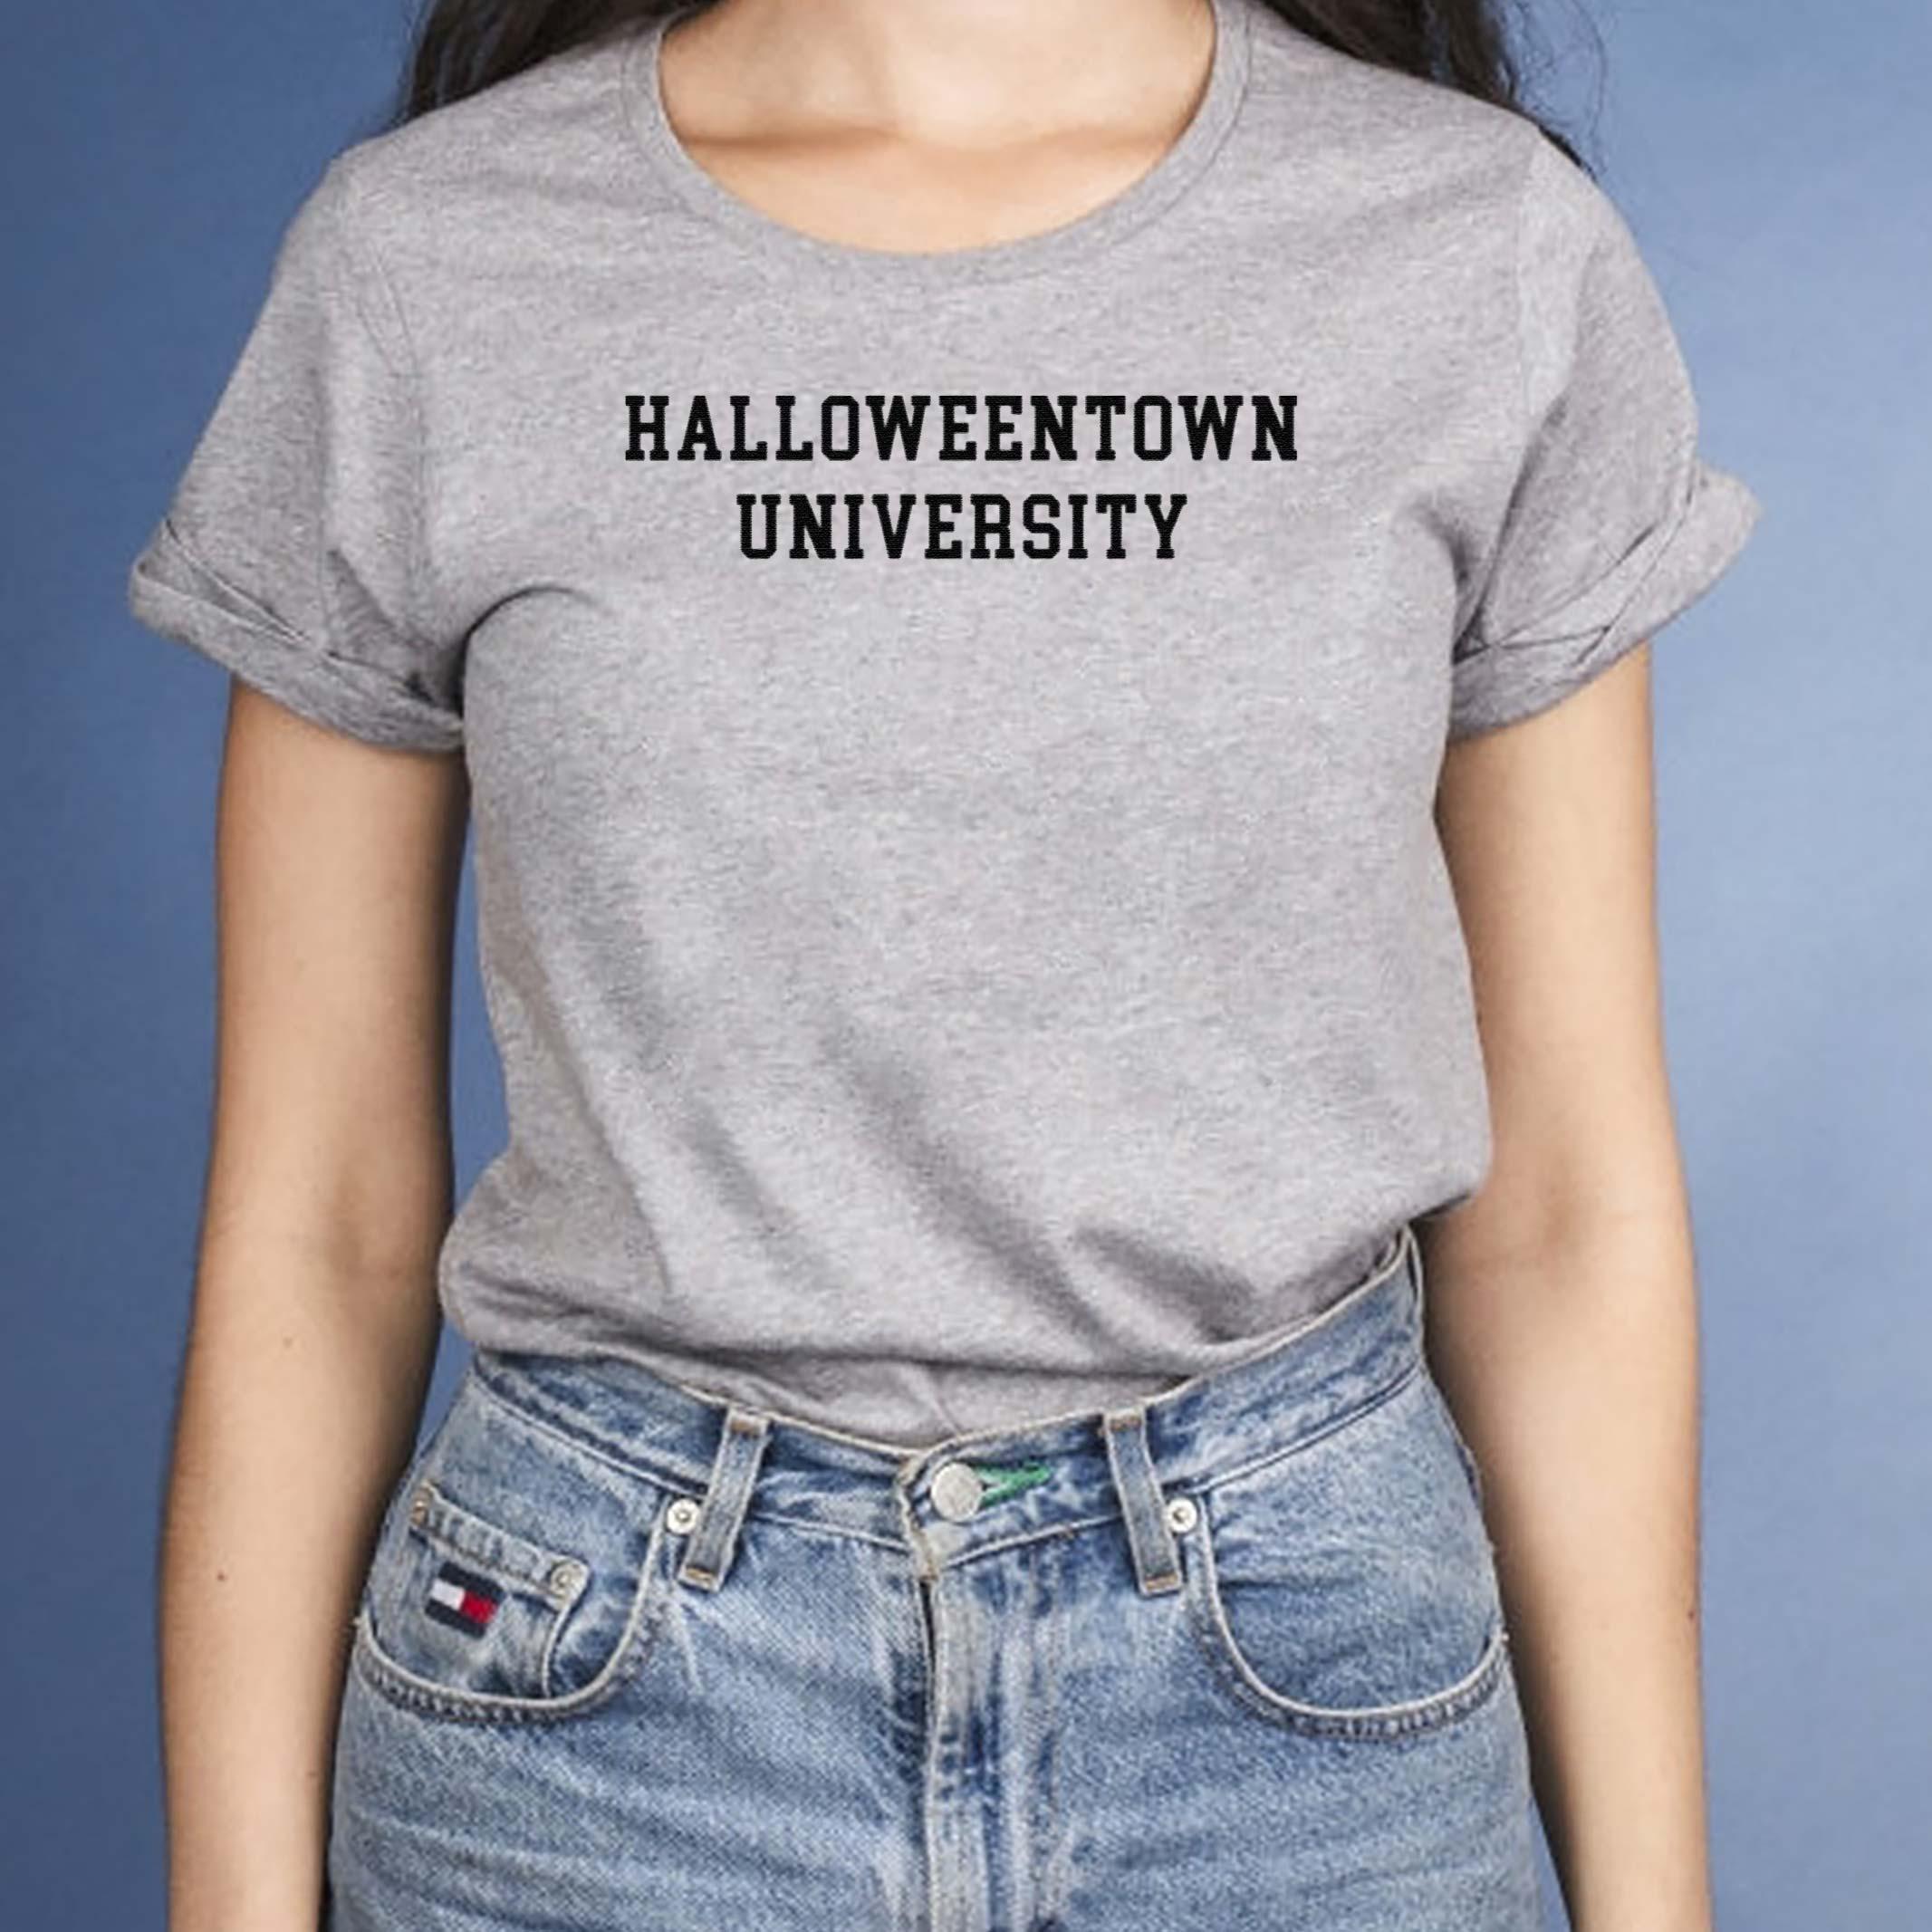 Halloweentown-University-Shirt